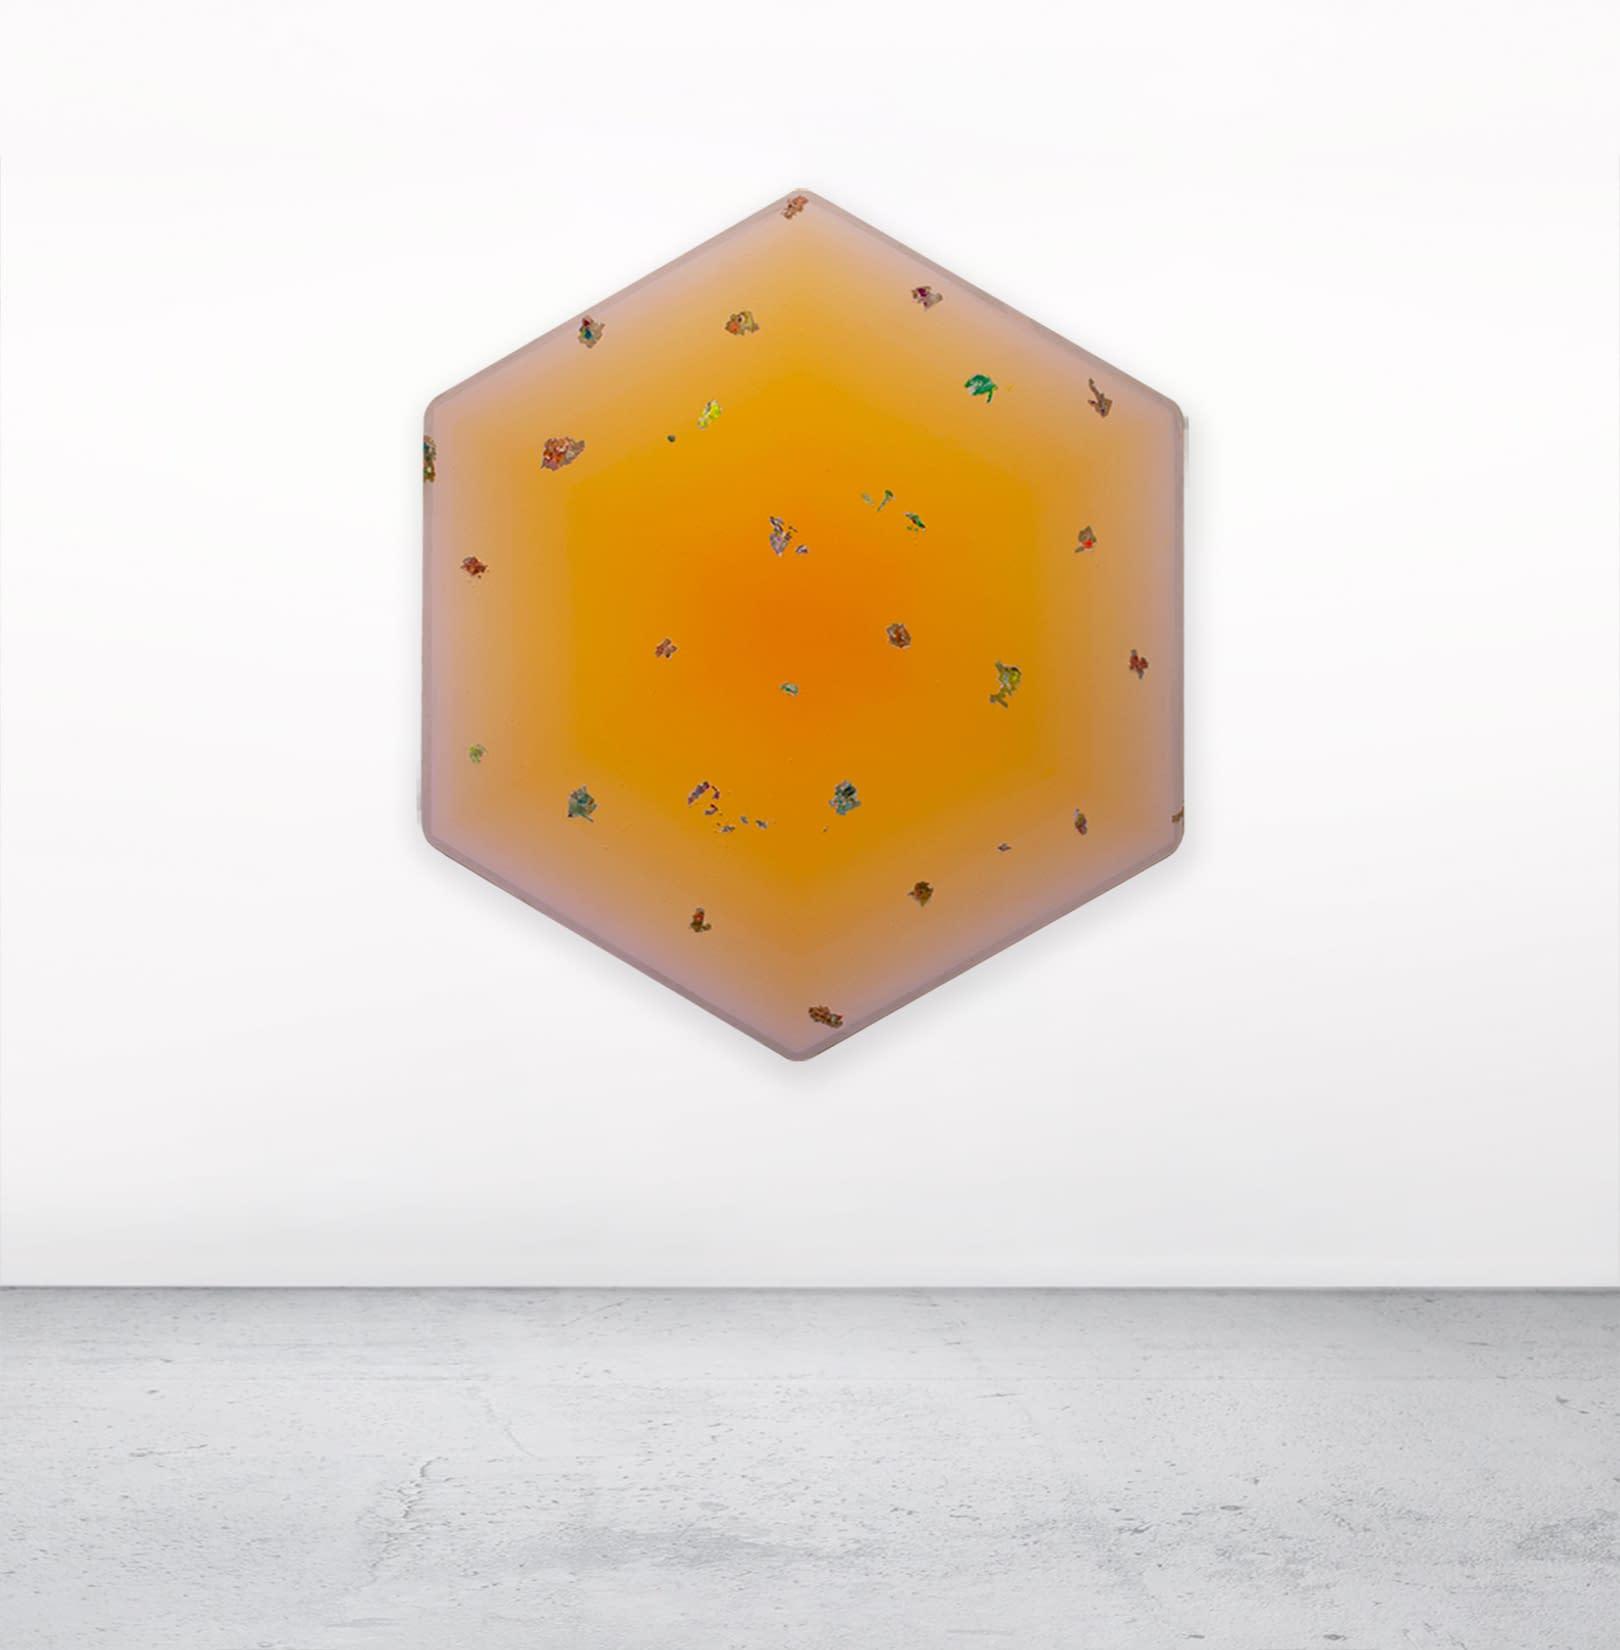 Mexican_Marigold_Lisa_Bartleson_Acrylic_on_Linen_65_x_56_x_1.5_Install